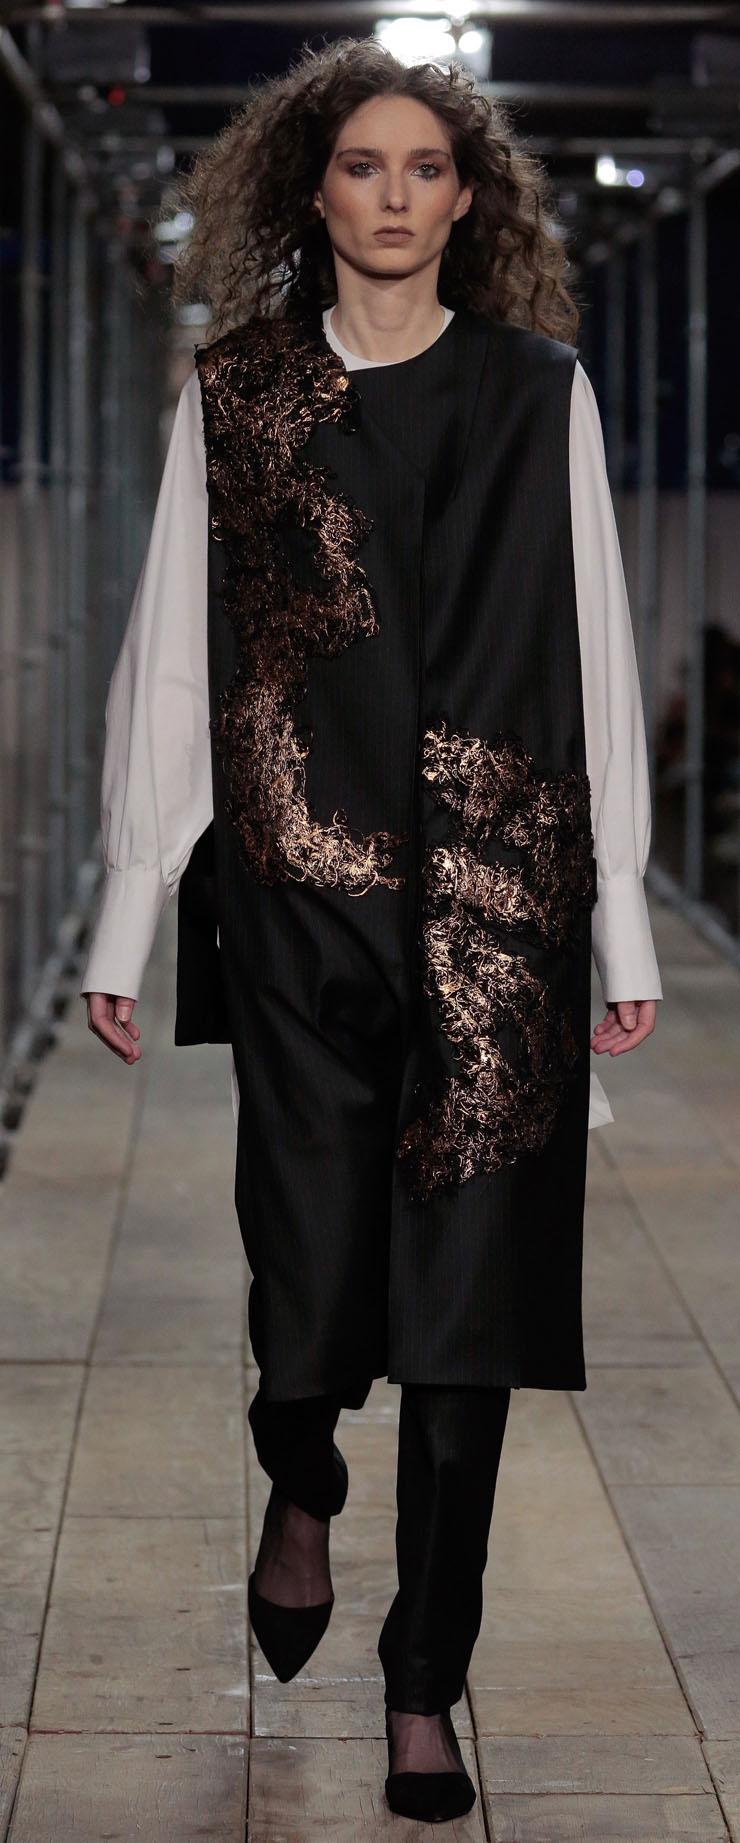 62_Denise Ramos, fashion design and Jorge Iglesias, textile design_CROPPED.jpg